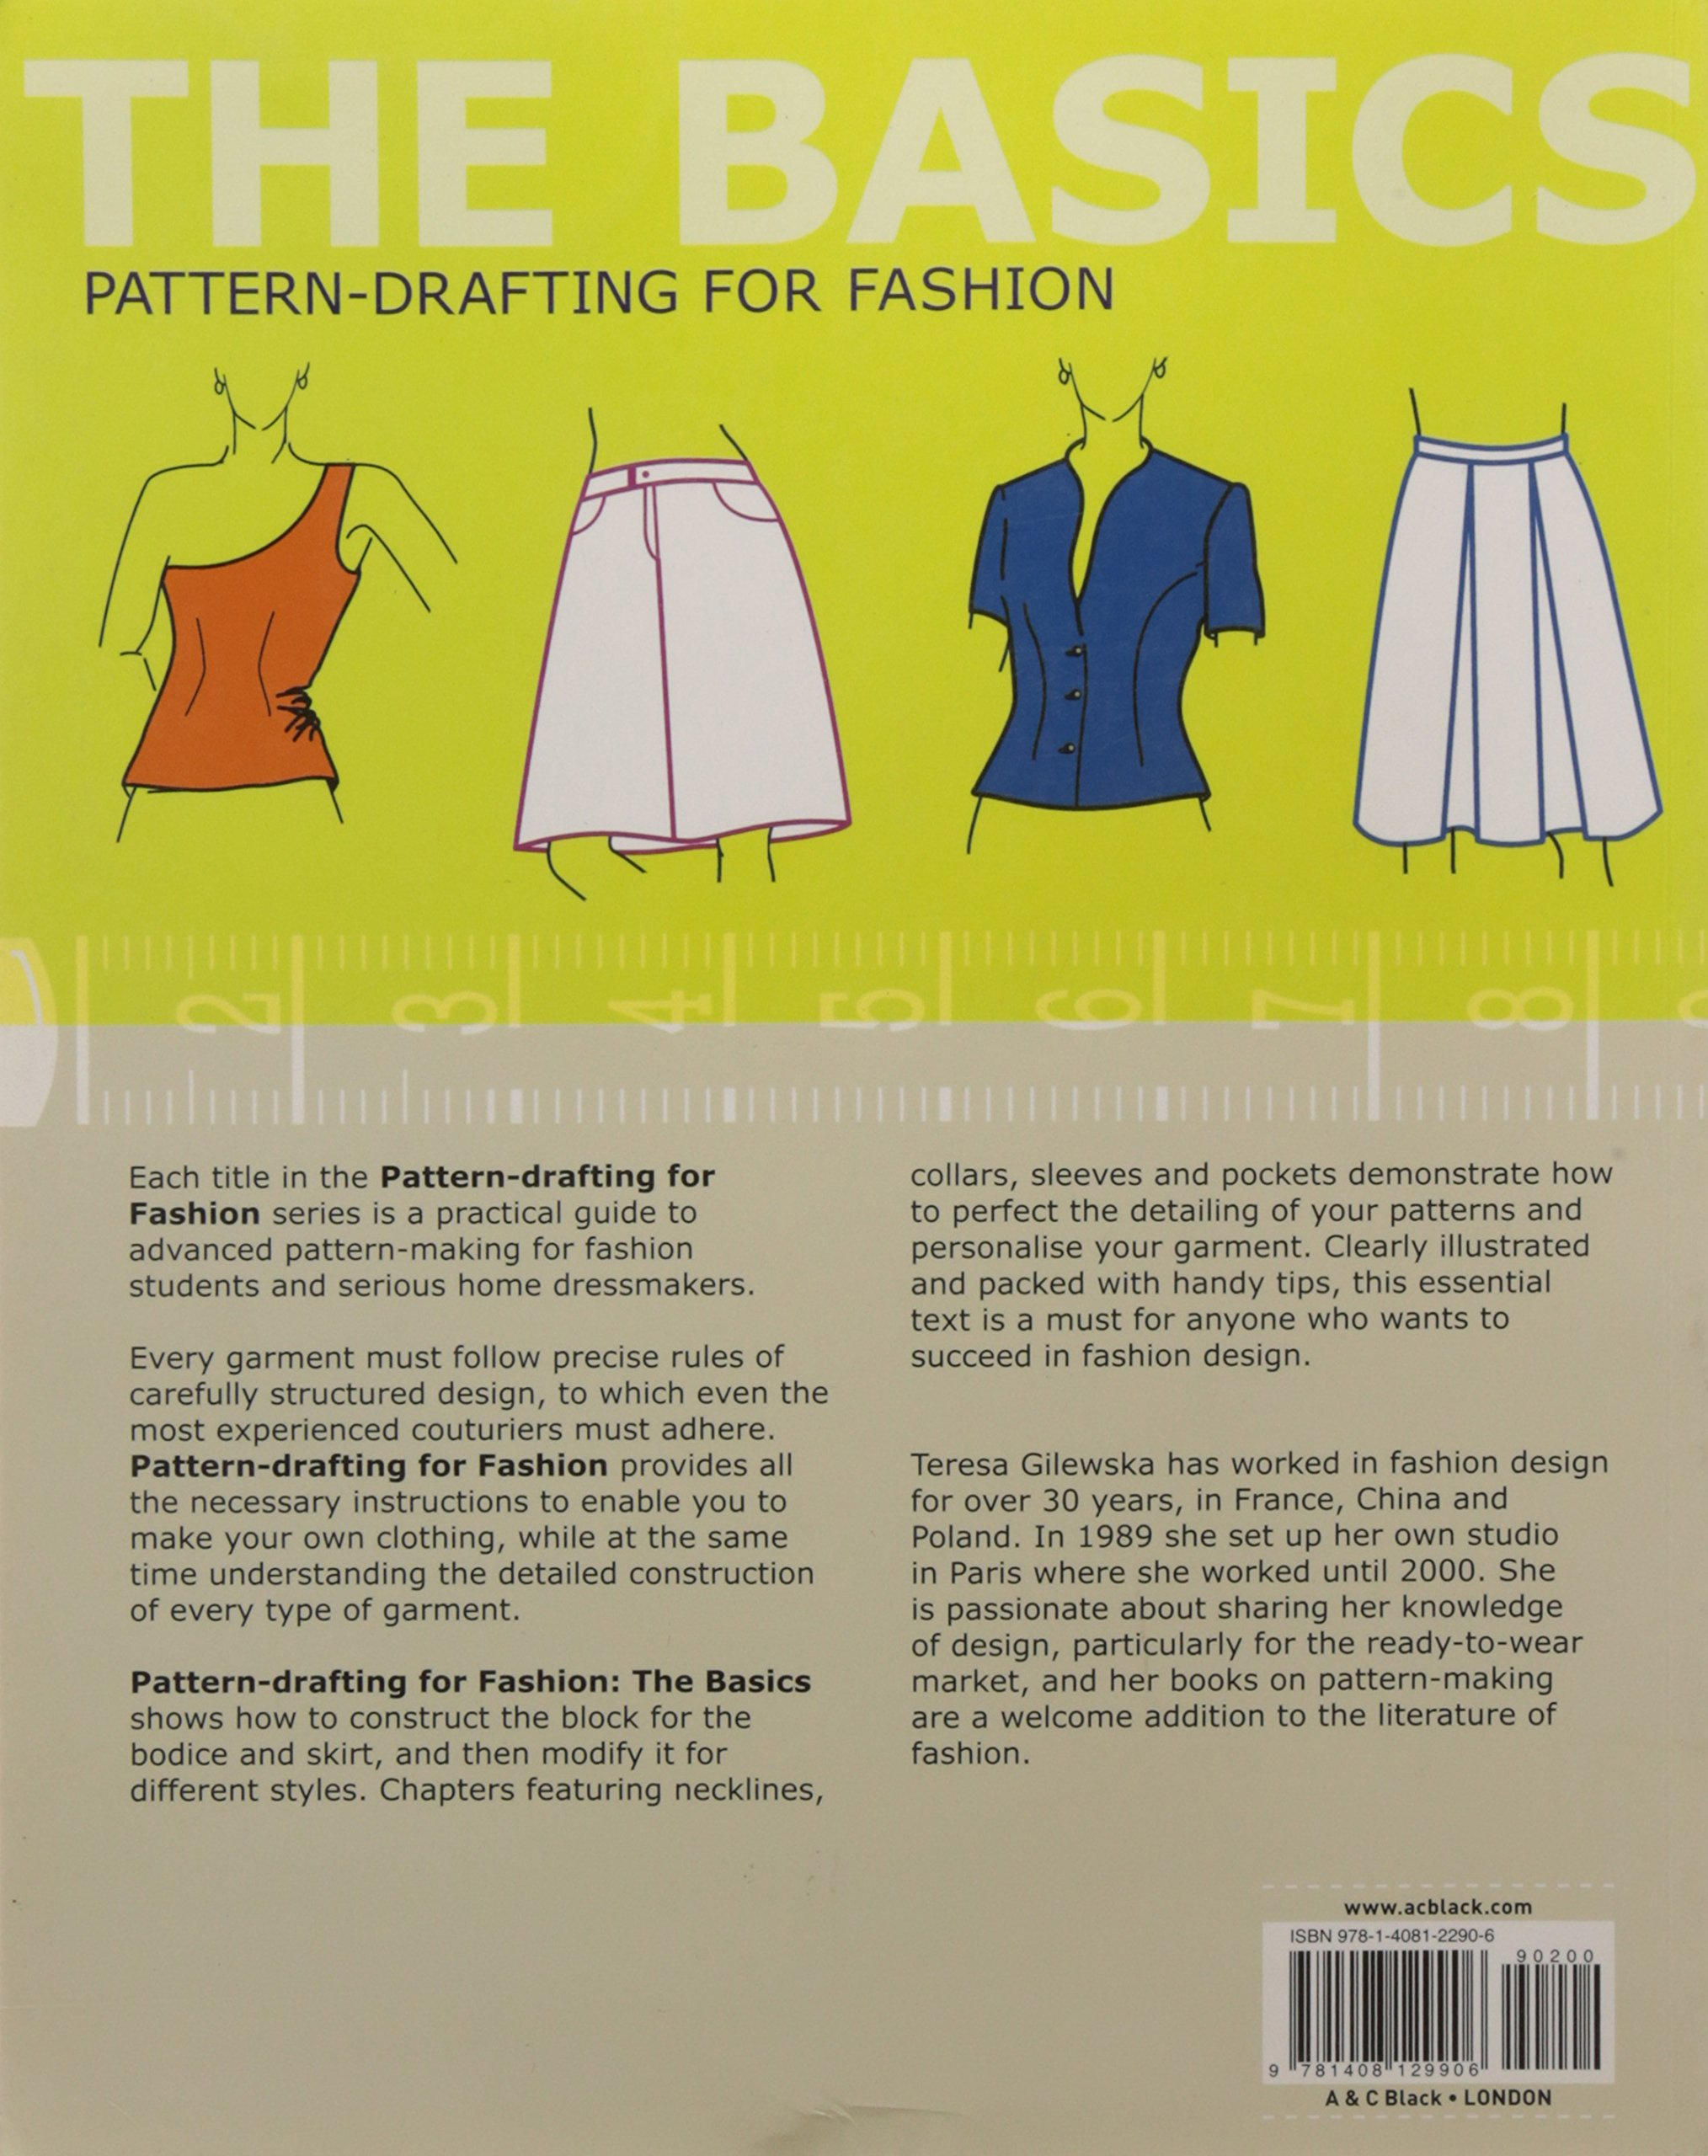 Pattern drafting for fashion the basics teresa gilewska pattern drafting for fashion the basics teresa gilewska 9781408129906 amazon books jeuxipadfo Image collections